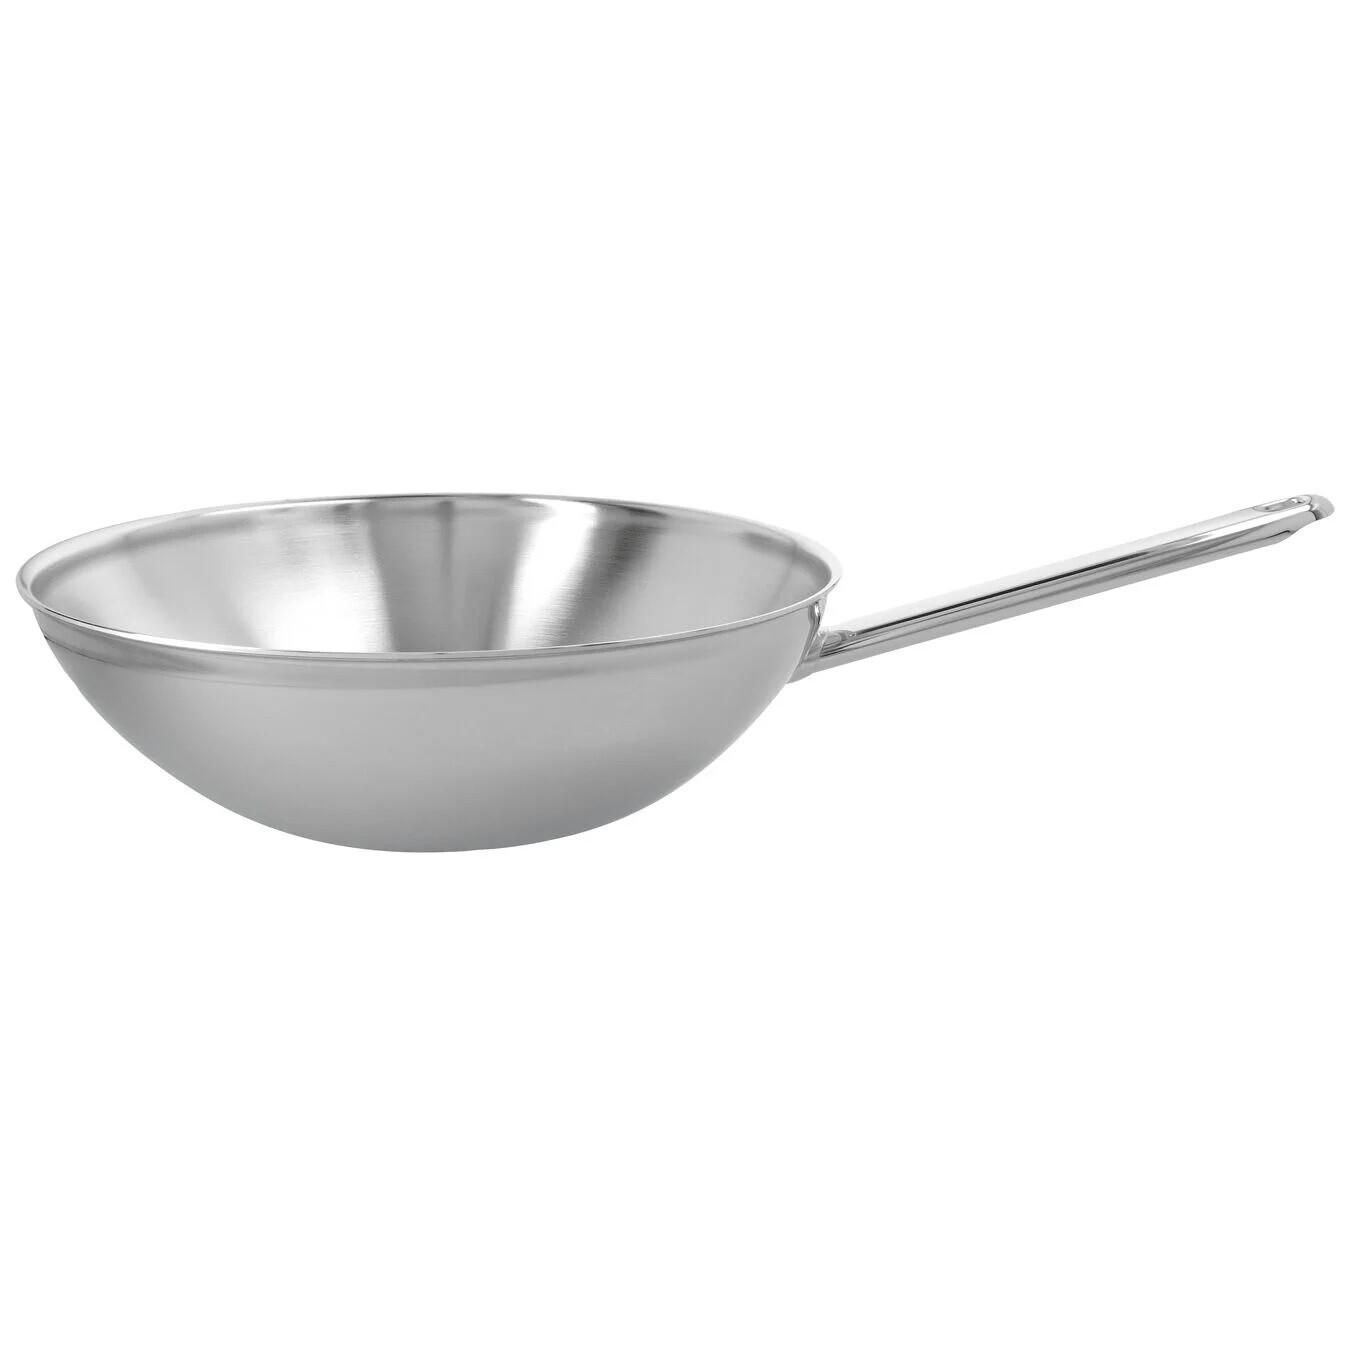 DEMEYERE 'apollo 7' wok 30cm PROMOPAKKET 189,00 -20% NU MET GRATIS GLAZEN DEKSEL TWV €30,00